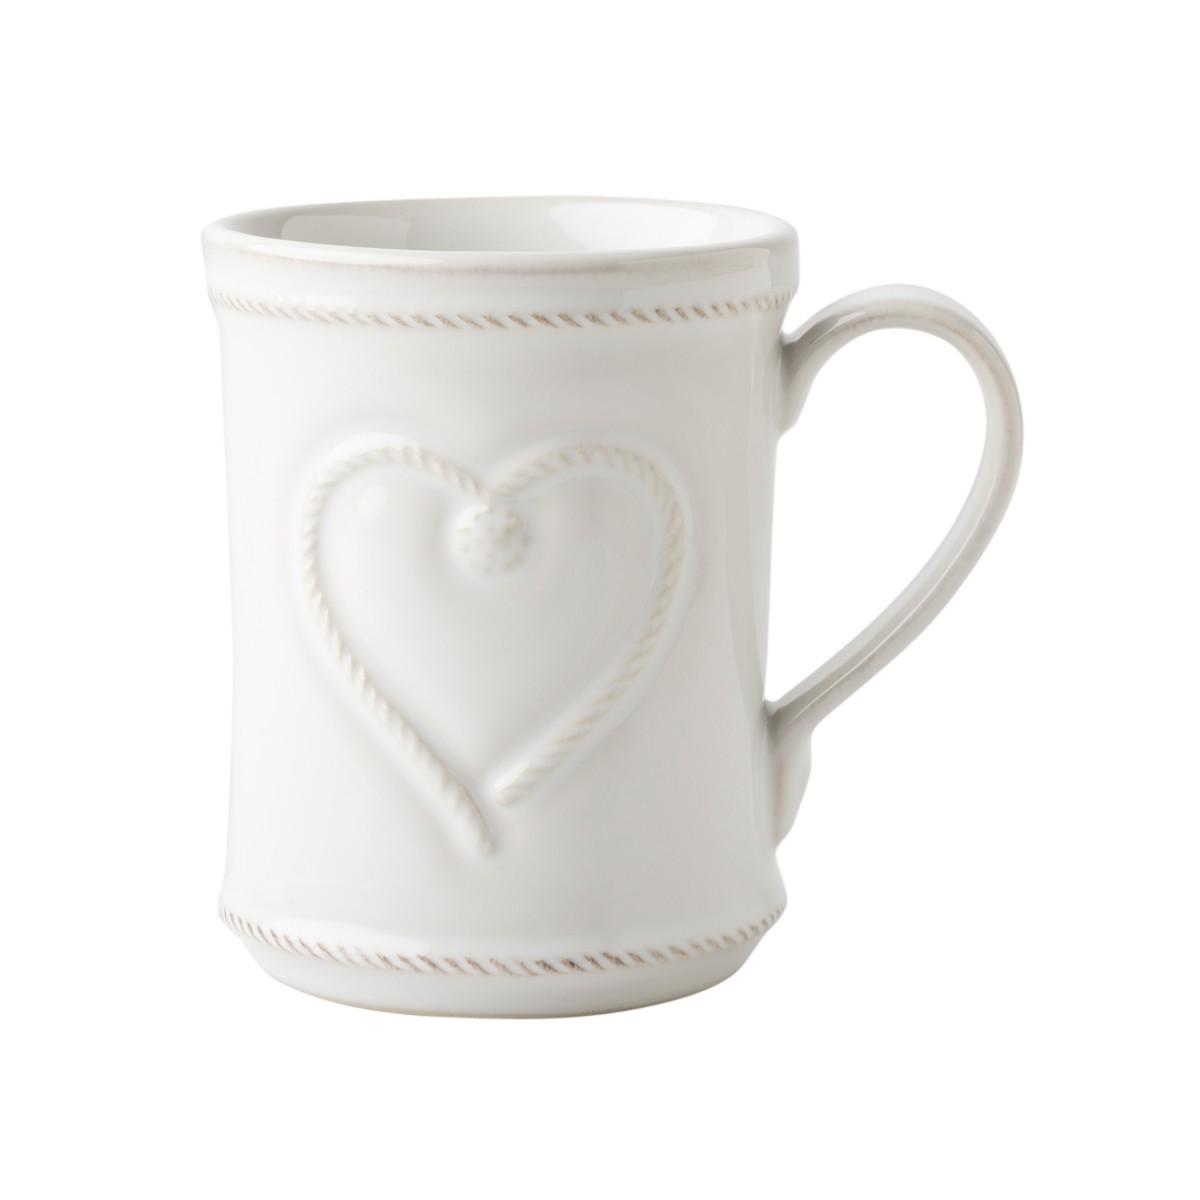 Juliska Berry & Thread Whitewash Cupfull of Love Mug